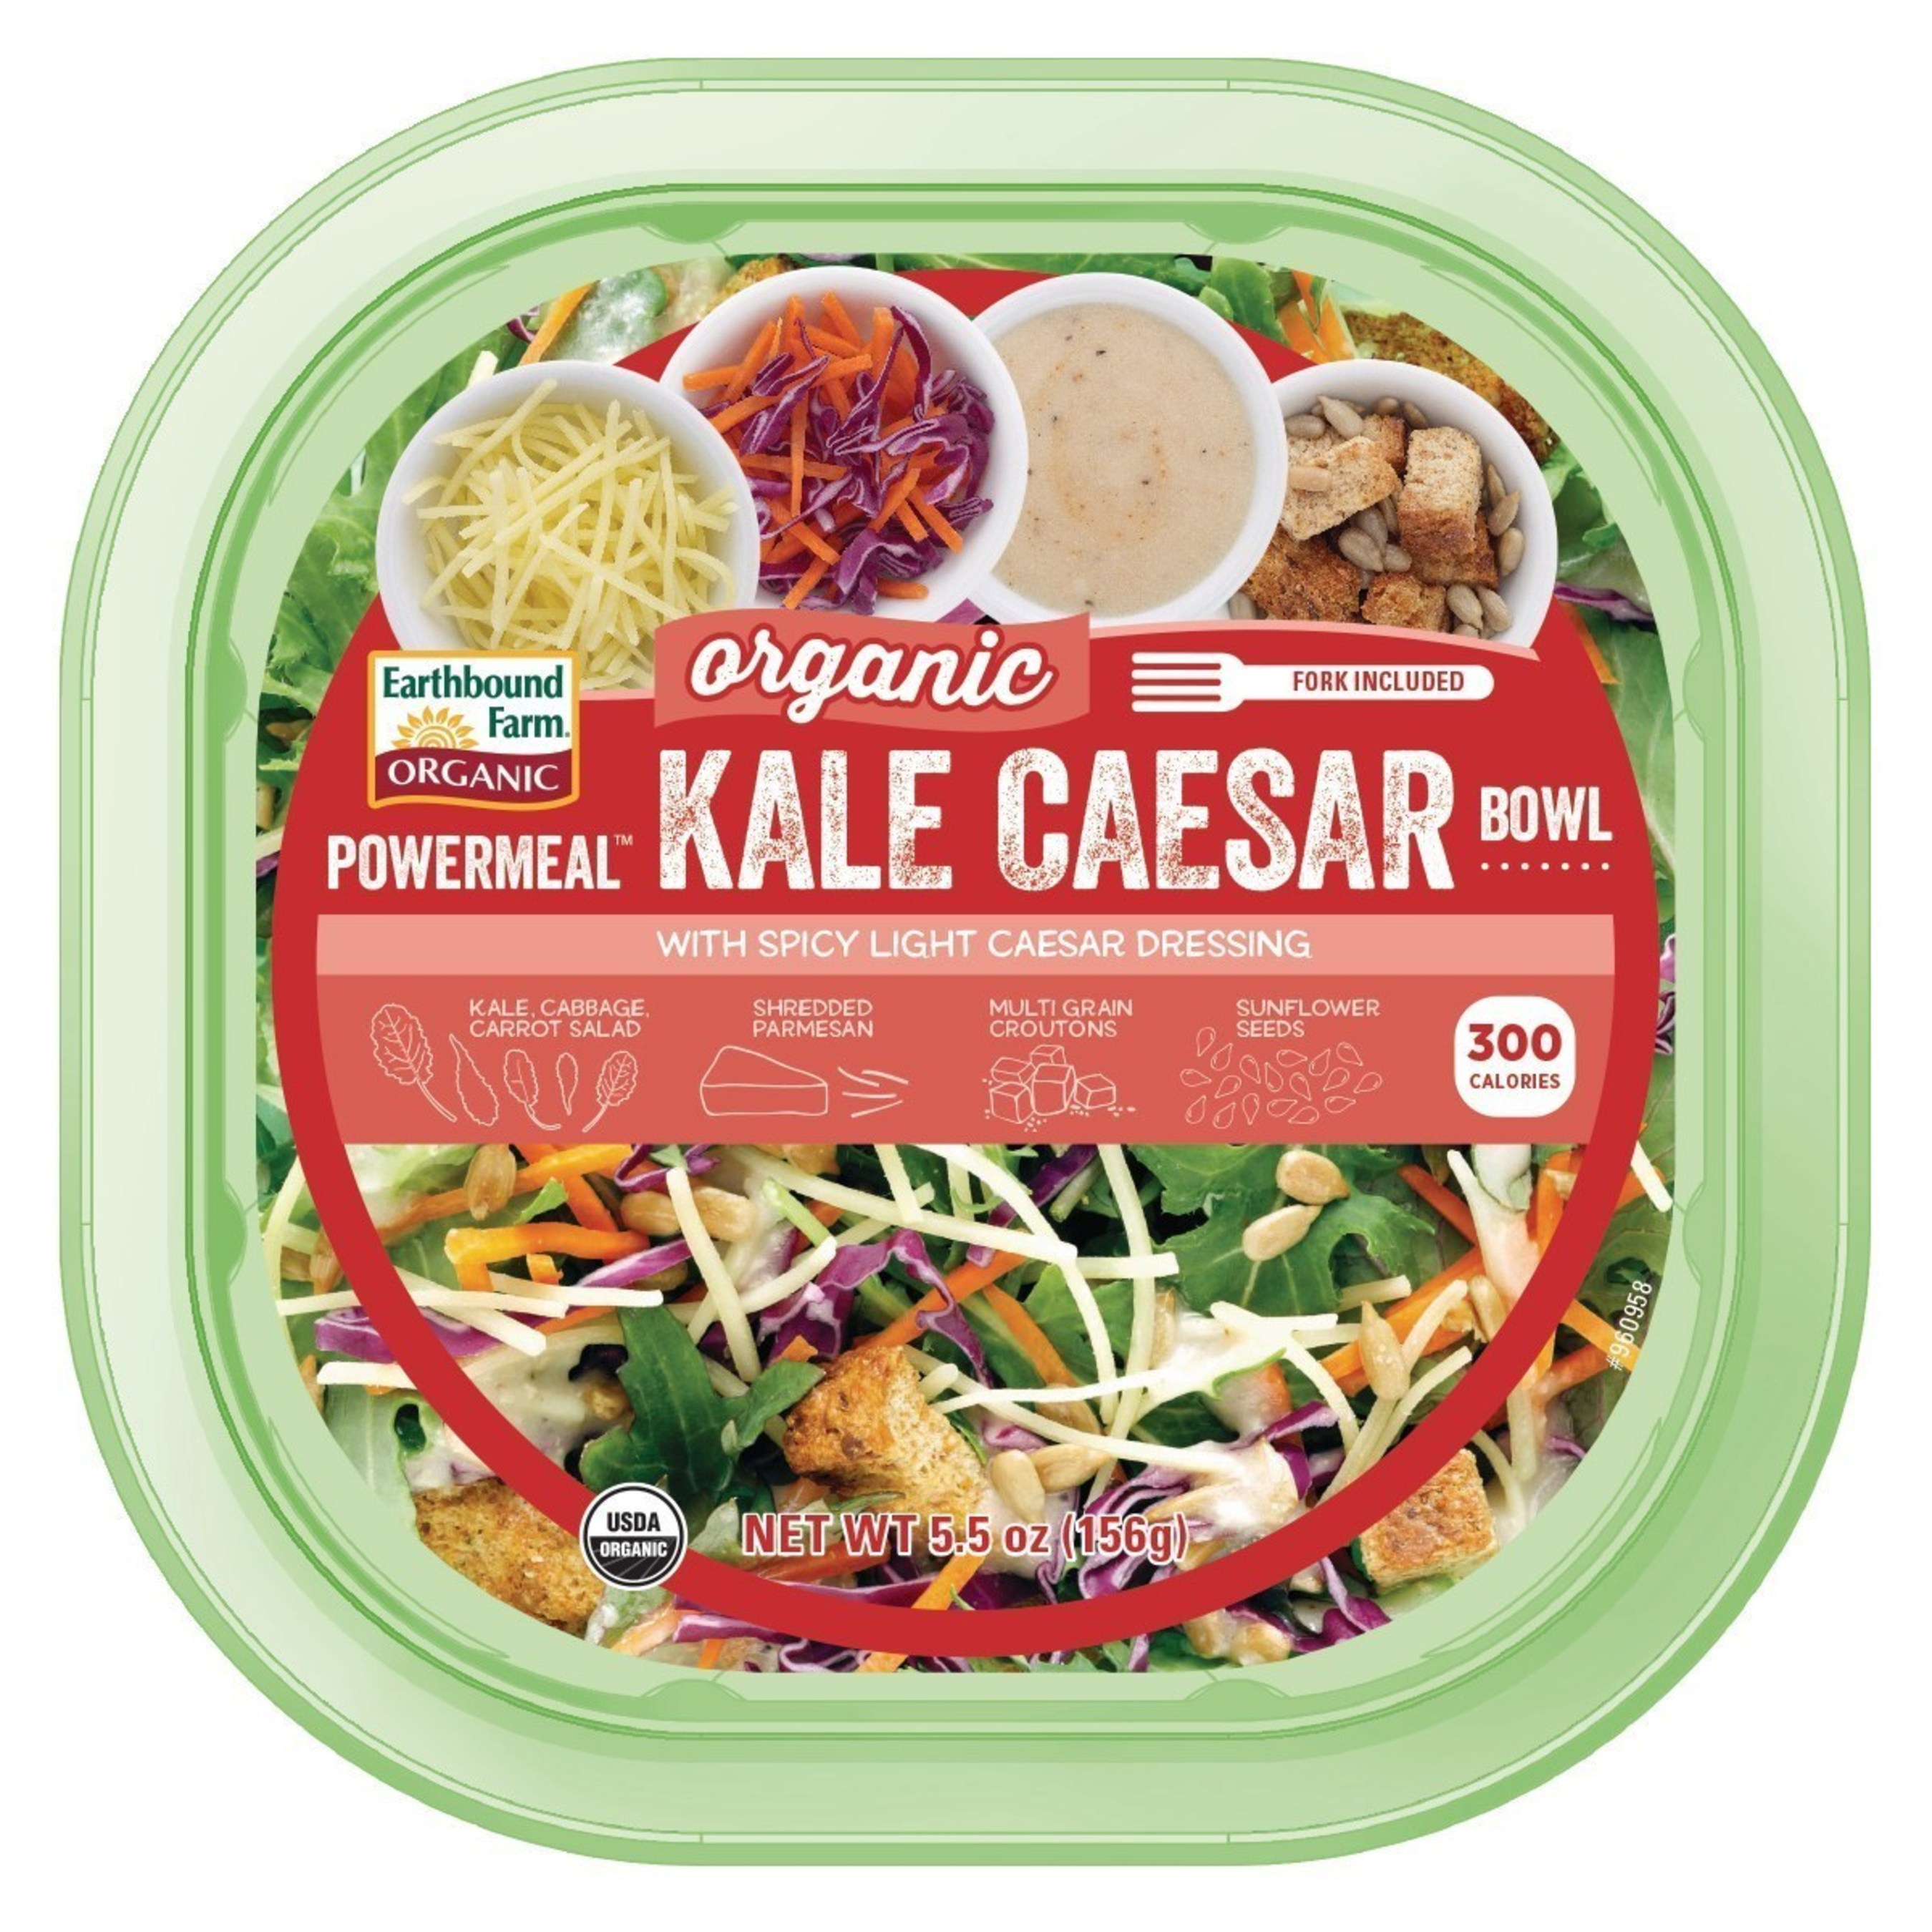 Earthbound Farm Launches New Organic Kale Caesar PowerMeal Bowl